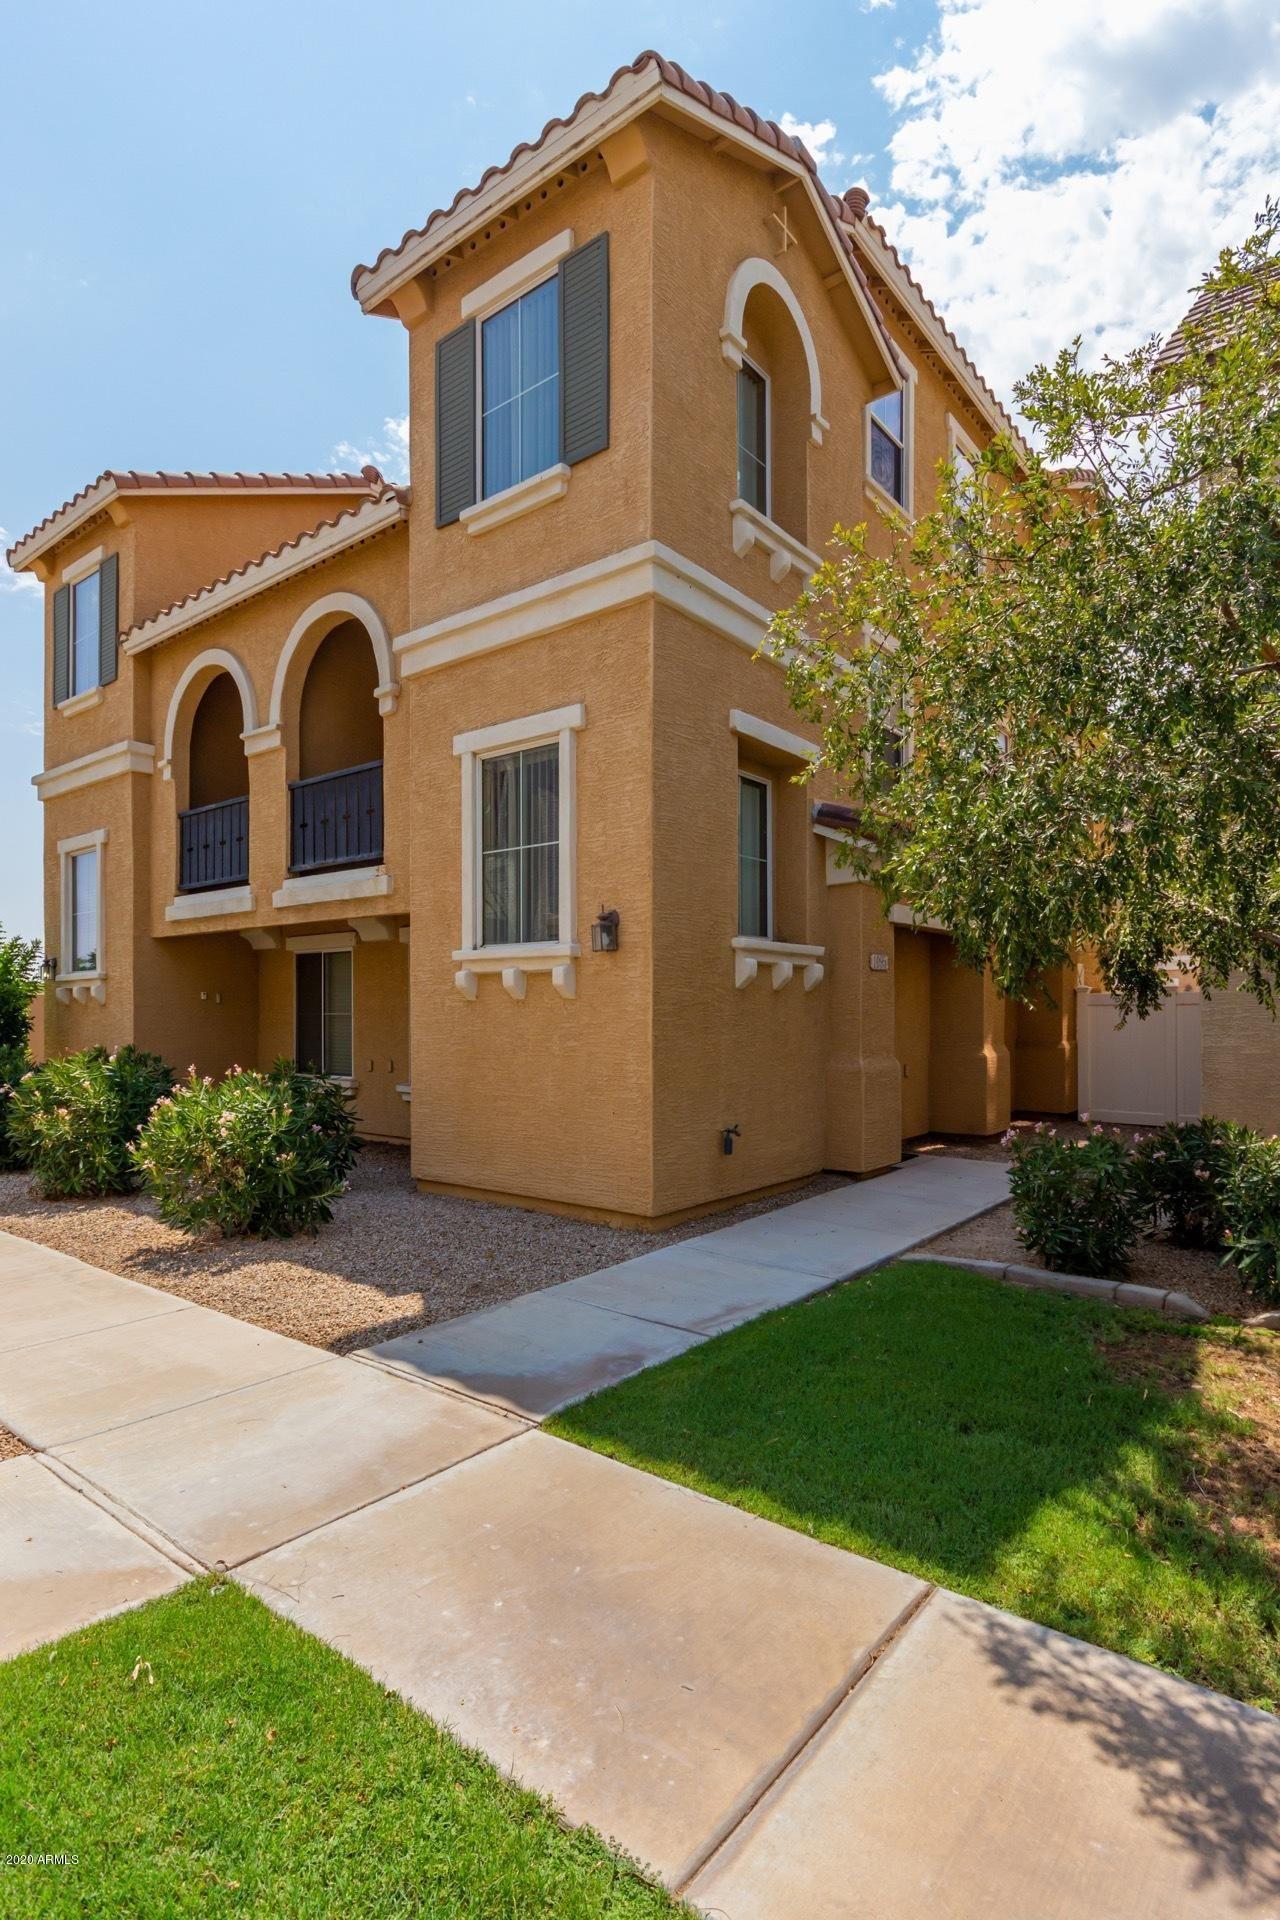 9233 E NEVILLE Avenue #1095, Mesa, AZ 85209 - MLS#: 6130701